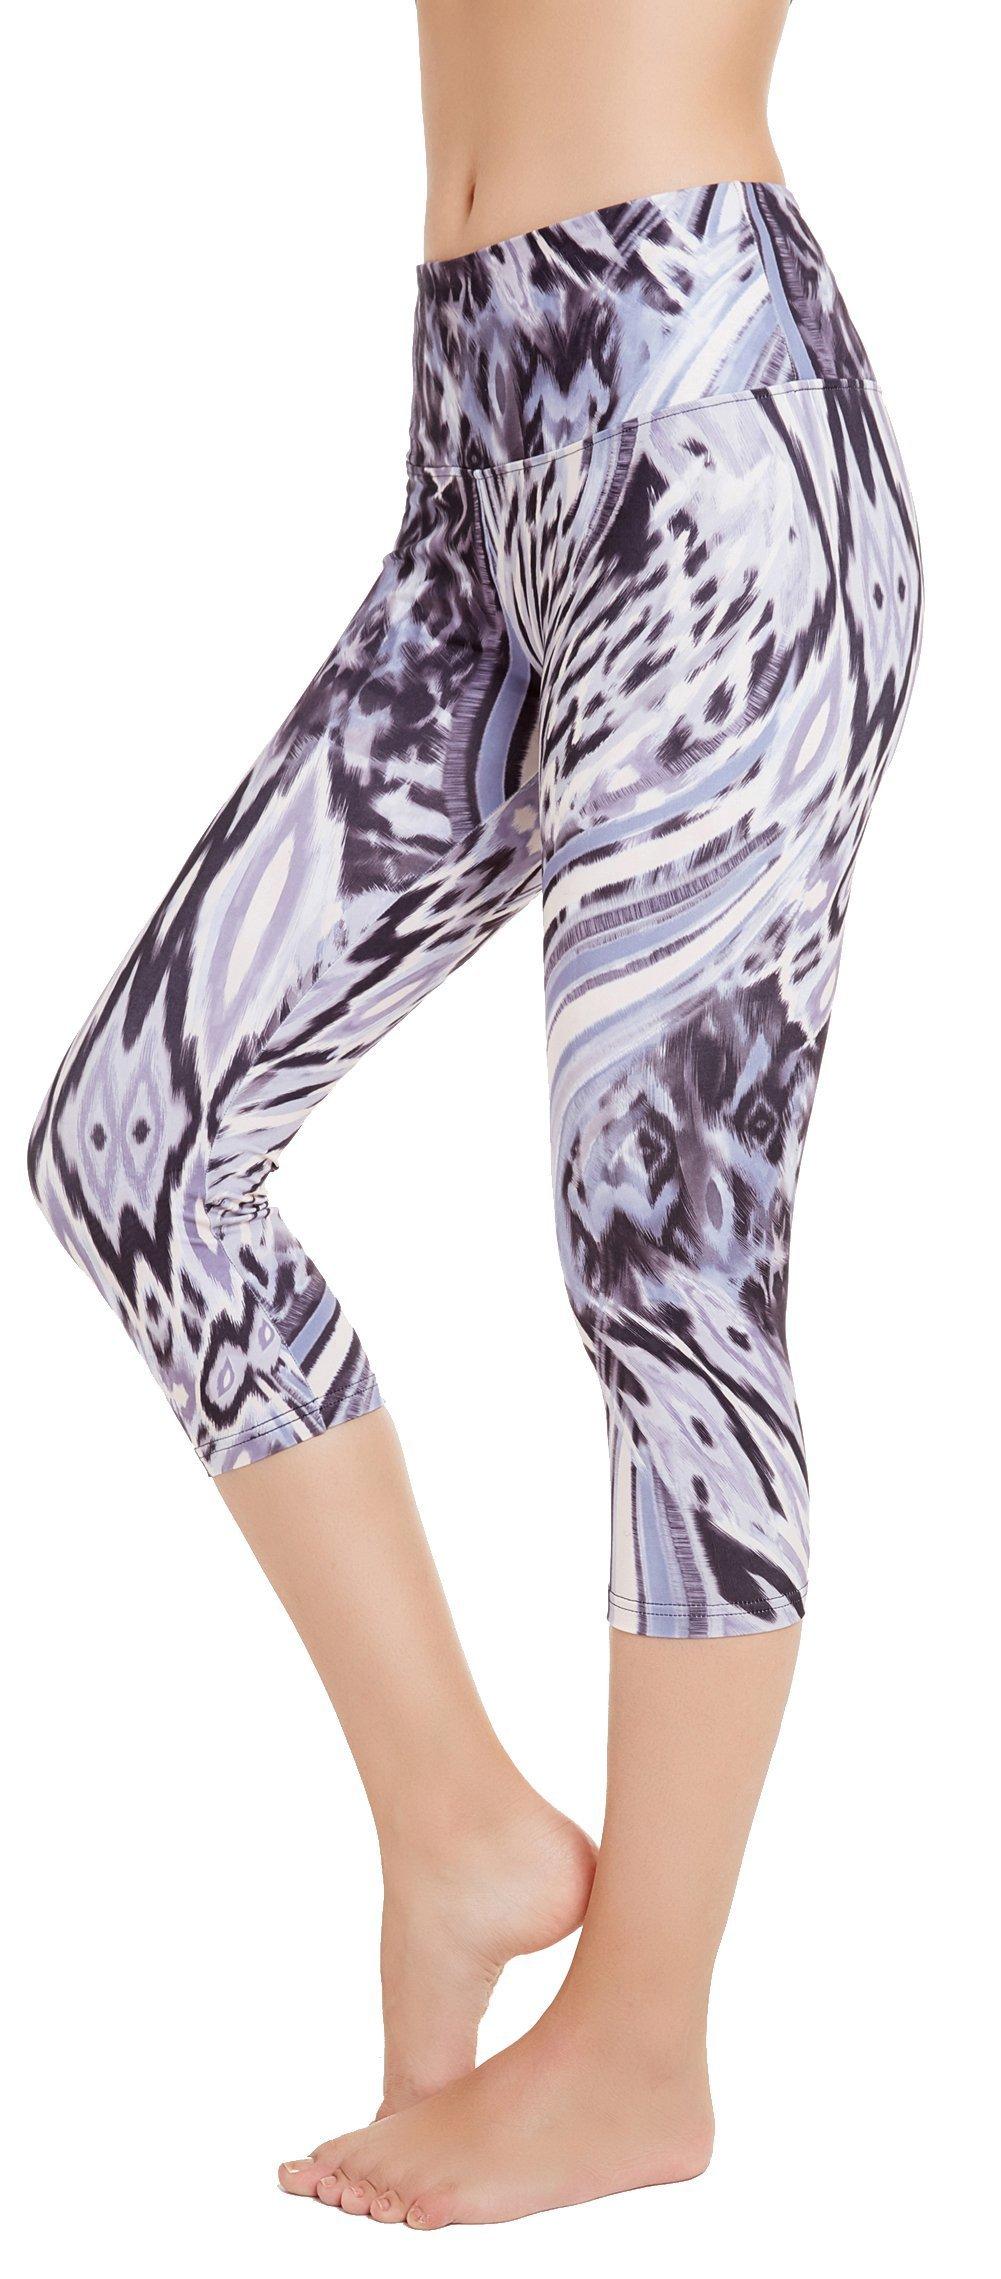 Picotee Women's Printed Yoga Pants Workout Running Capri Leggings w Hidden Pocket (Feather, M)